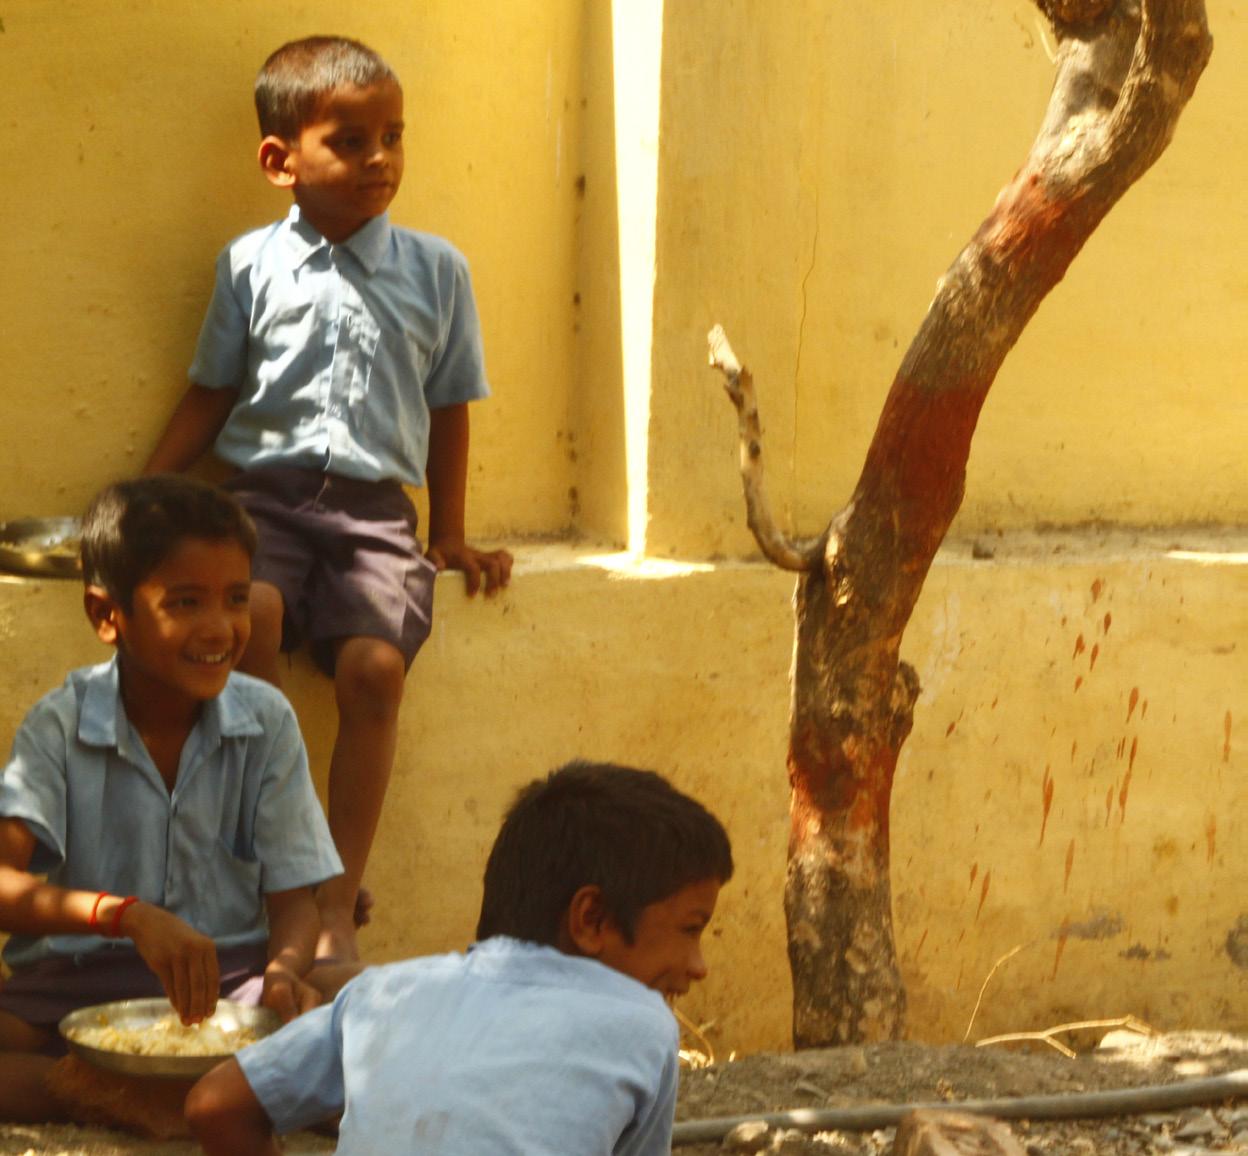 Field studies in education 4